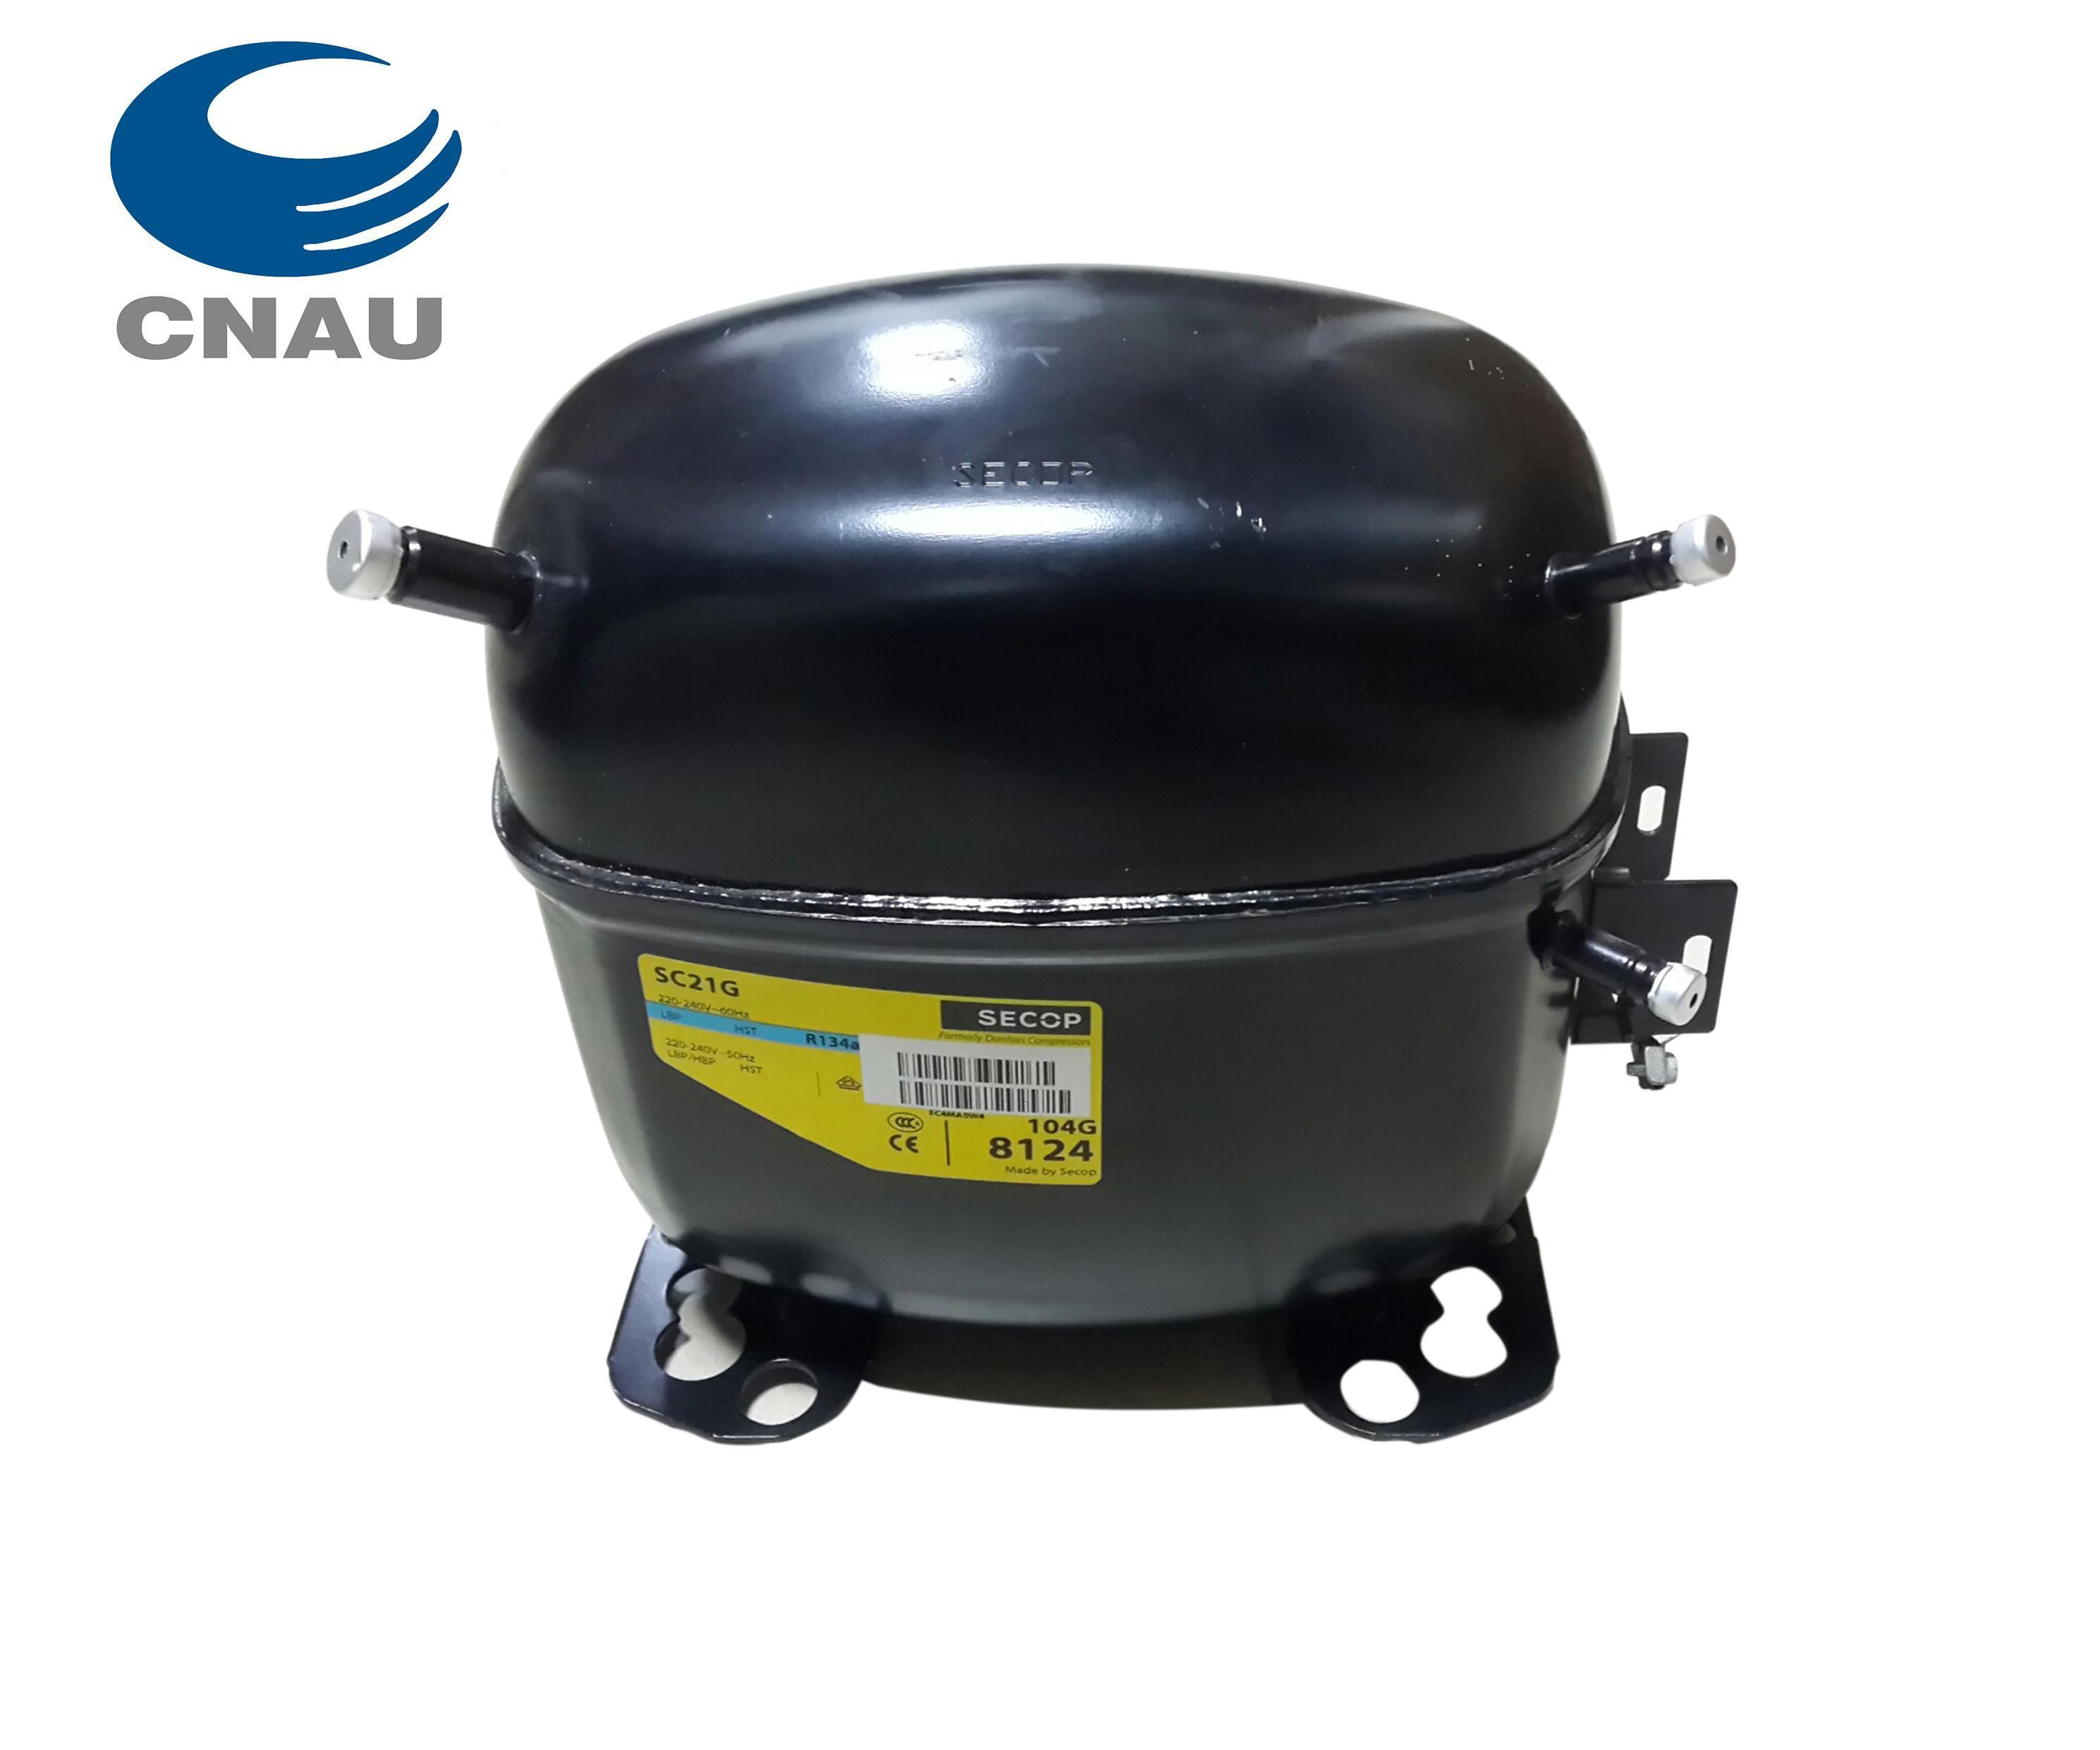 Secop Reciprocating Refrigerator Compressor (Danfoss Commercial Series)